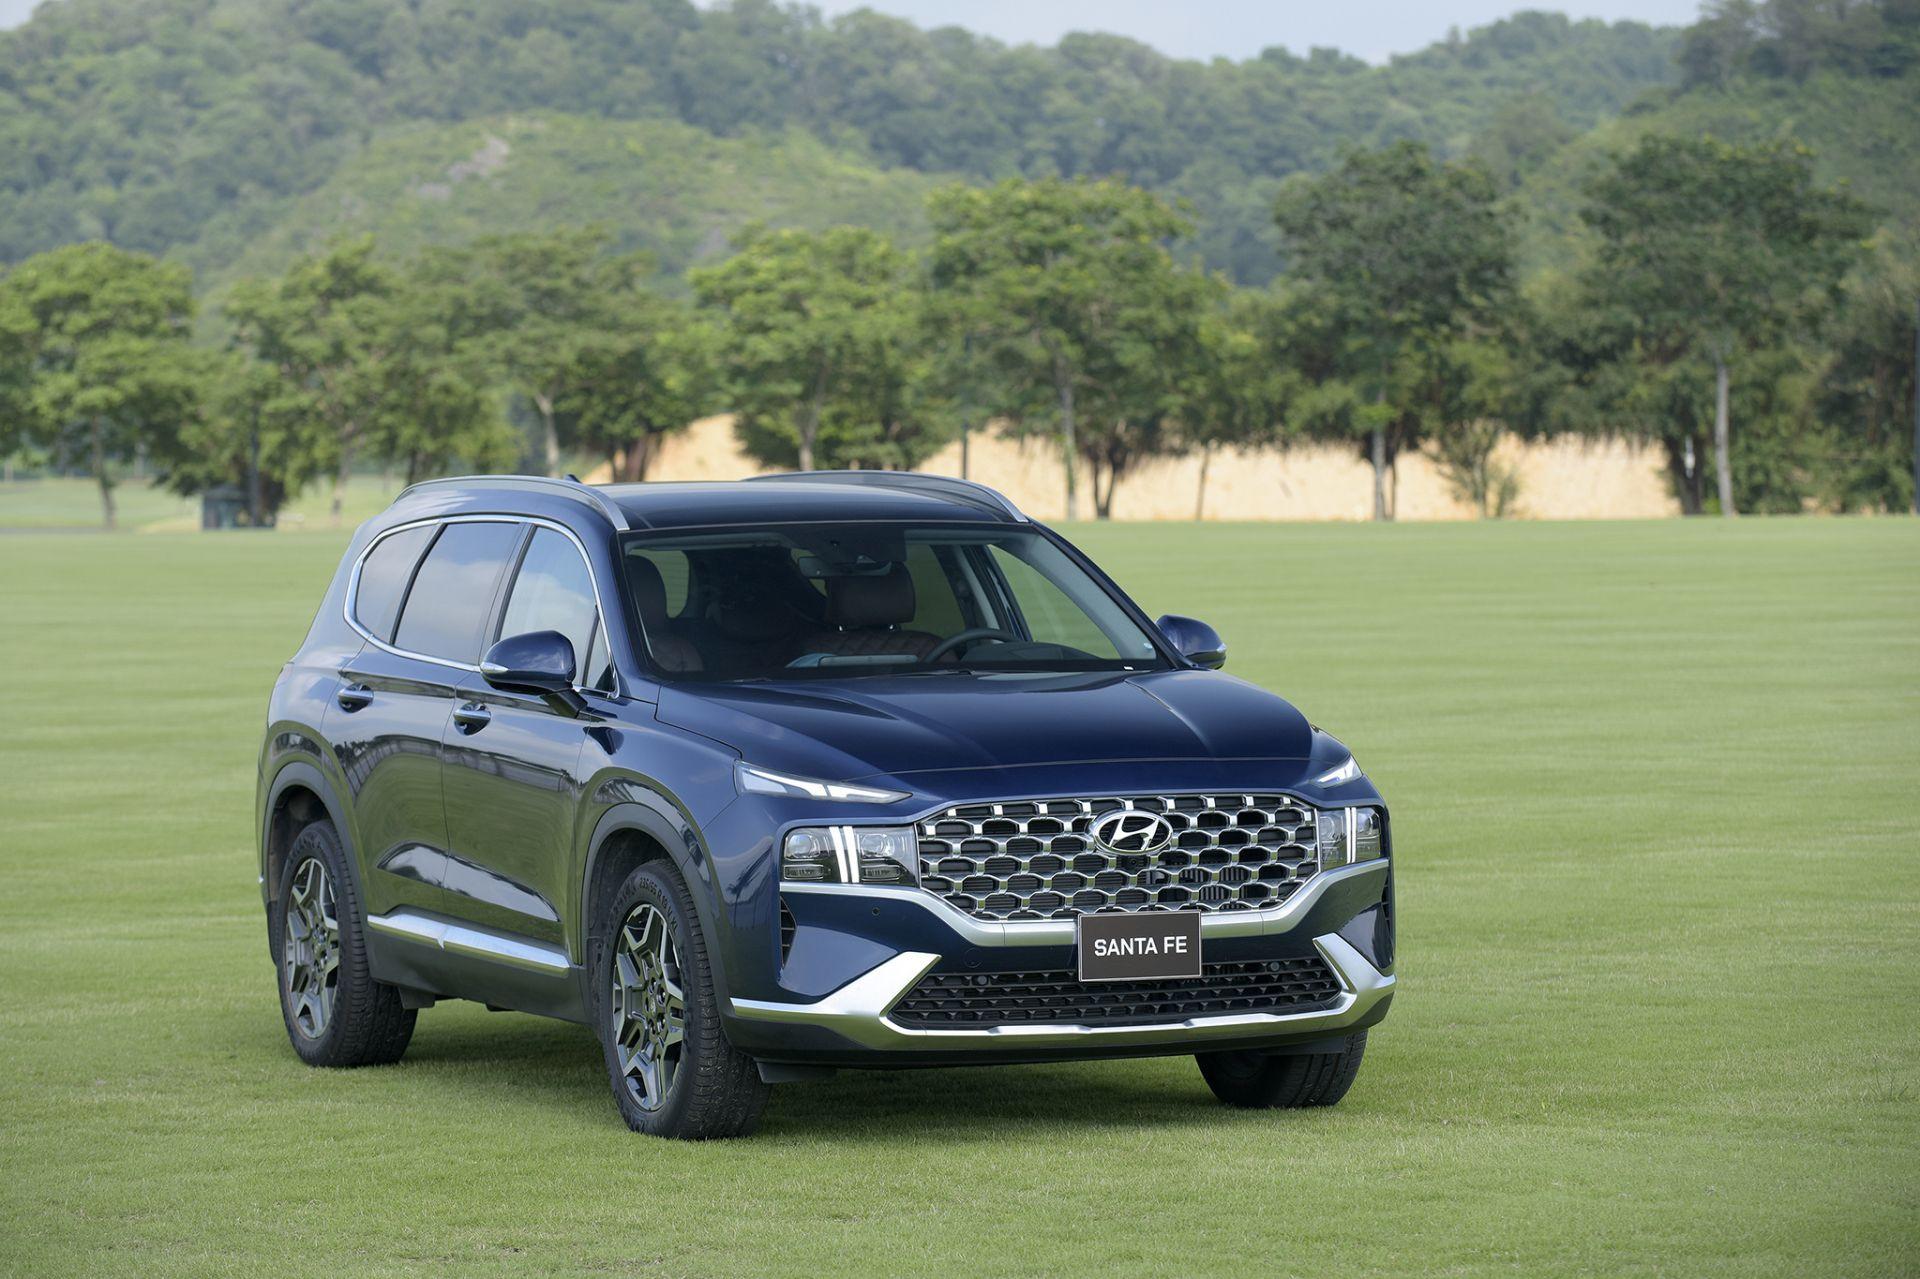 Hyundai Santa Fe 2021 có doanh số cao trong tháng 6/2021